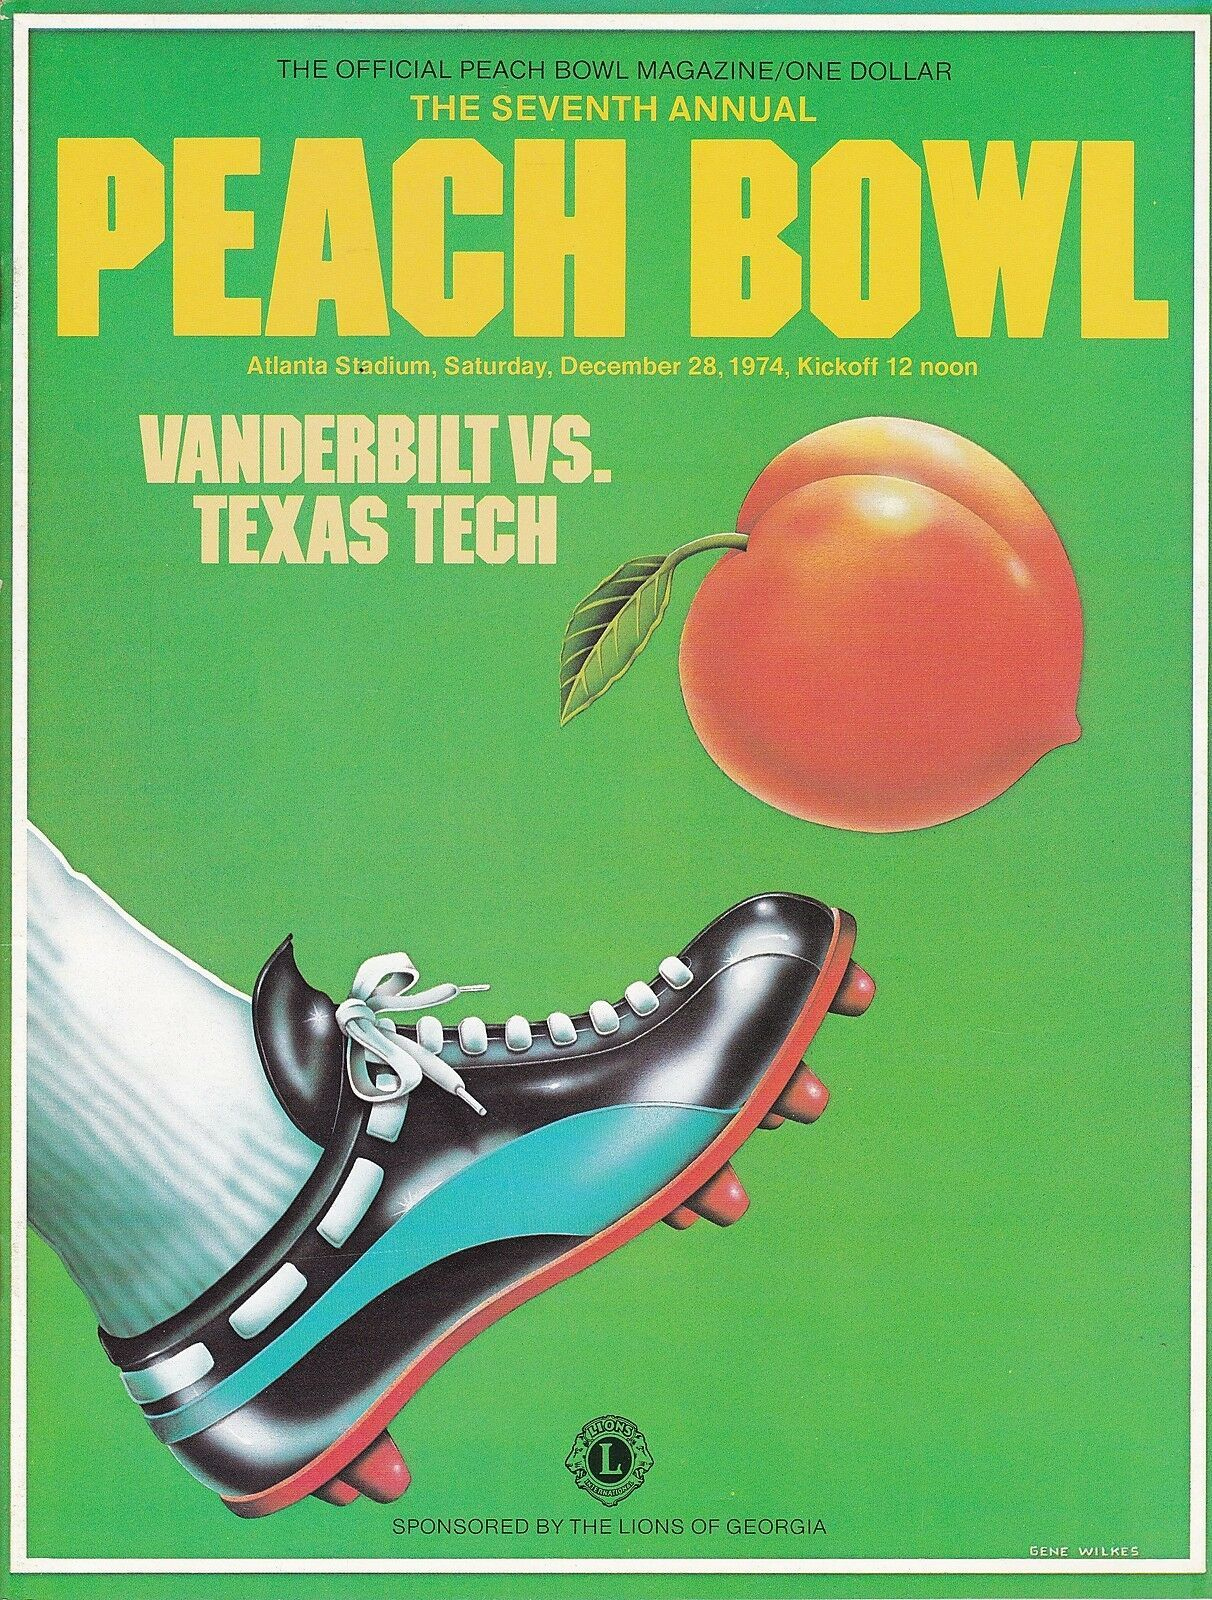 Epic. Michael Crabtree. Texas Tech vs UT, 2008. Jones AT